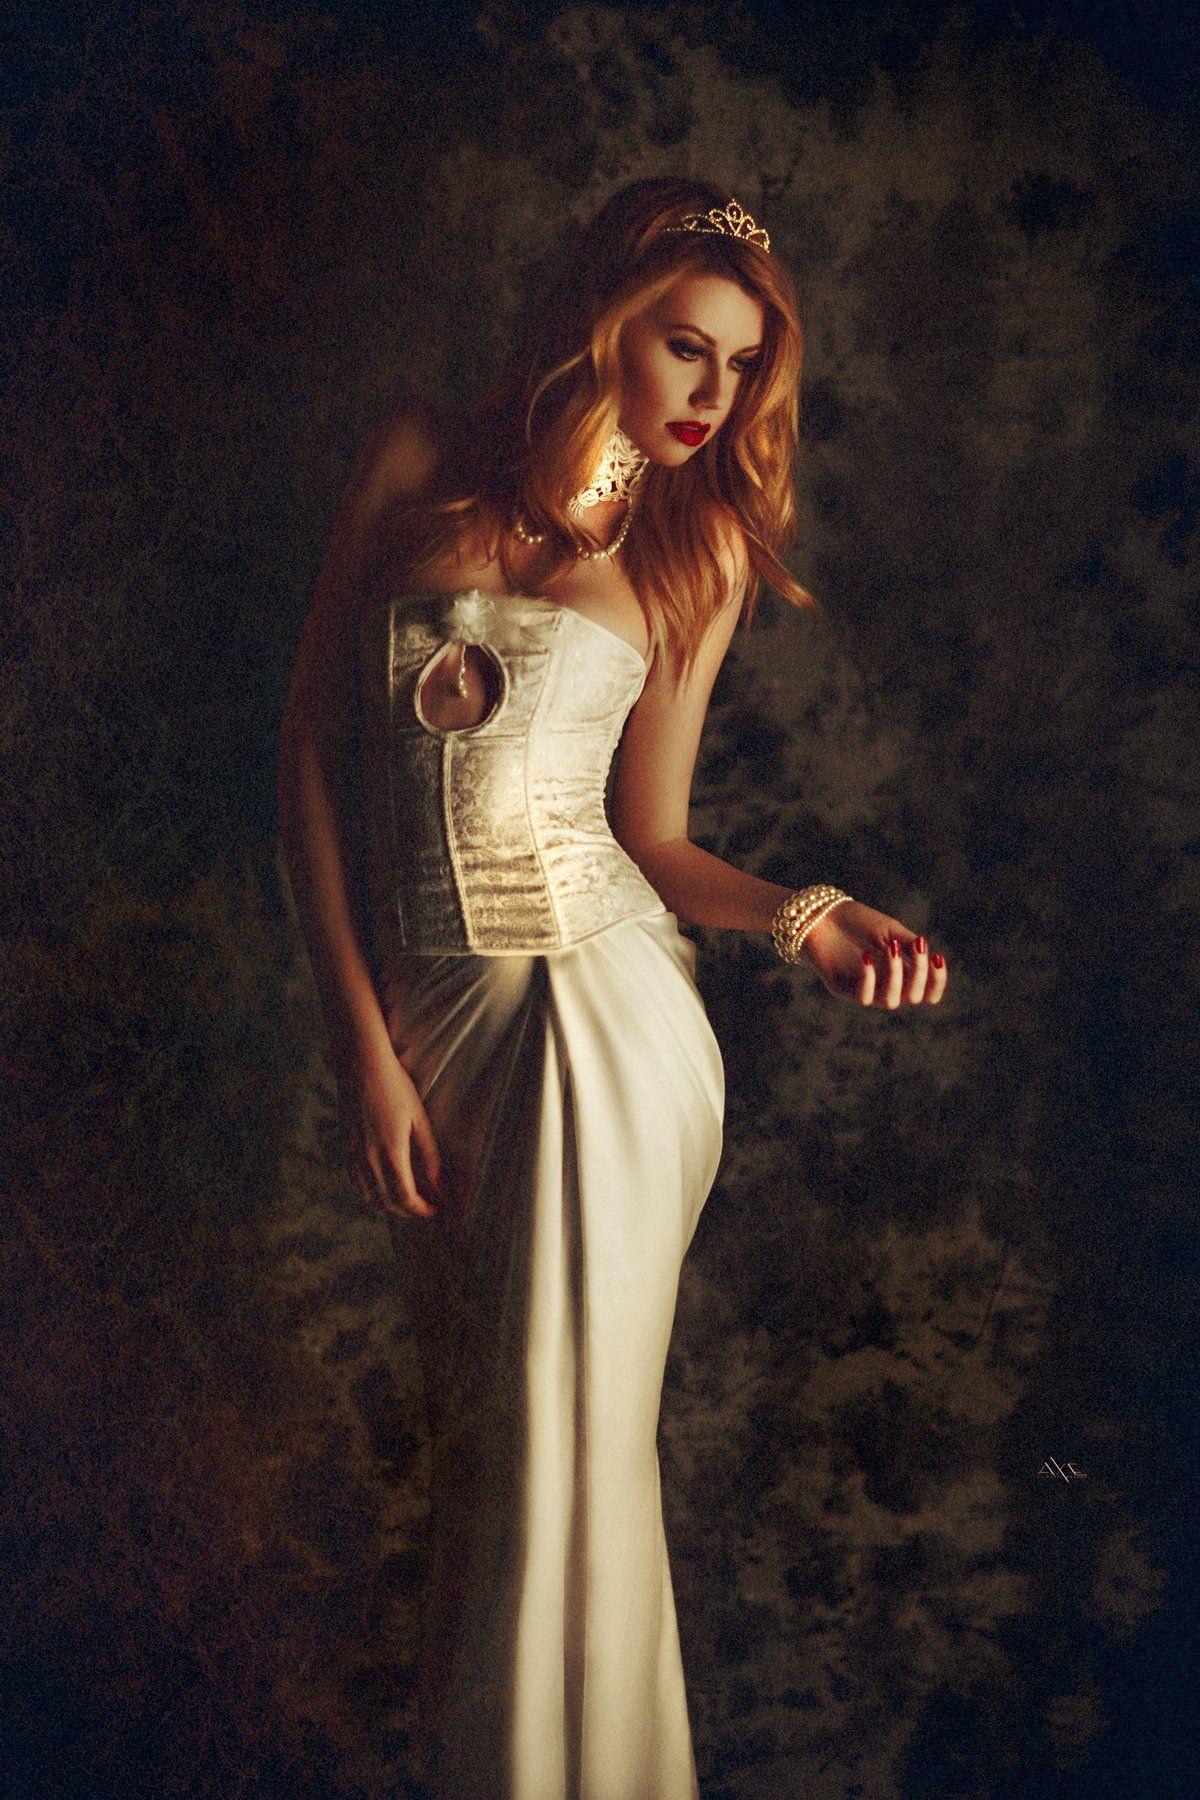 Light, Mood, Portrait, Studio, Woman, Руслан Болгов (Axe)